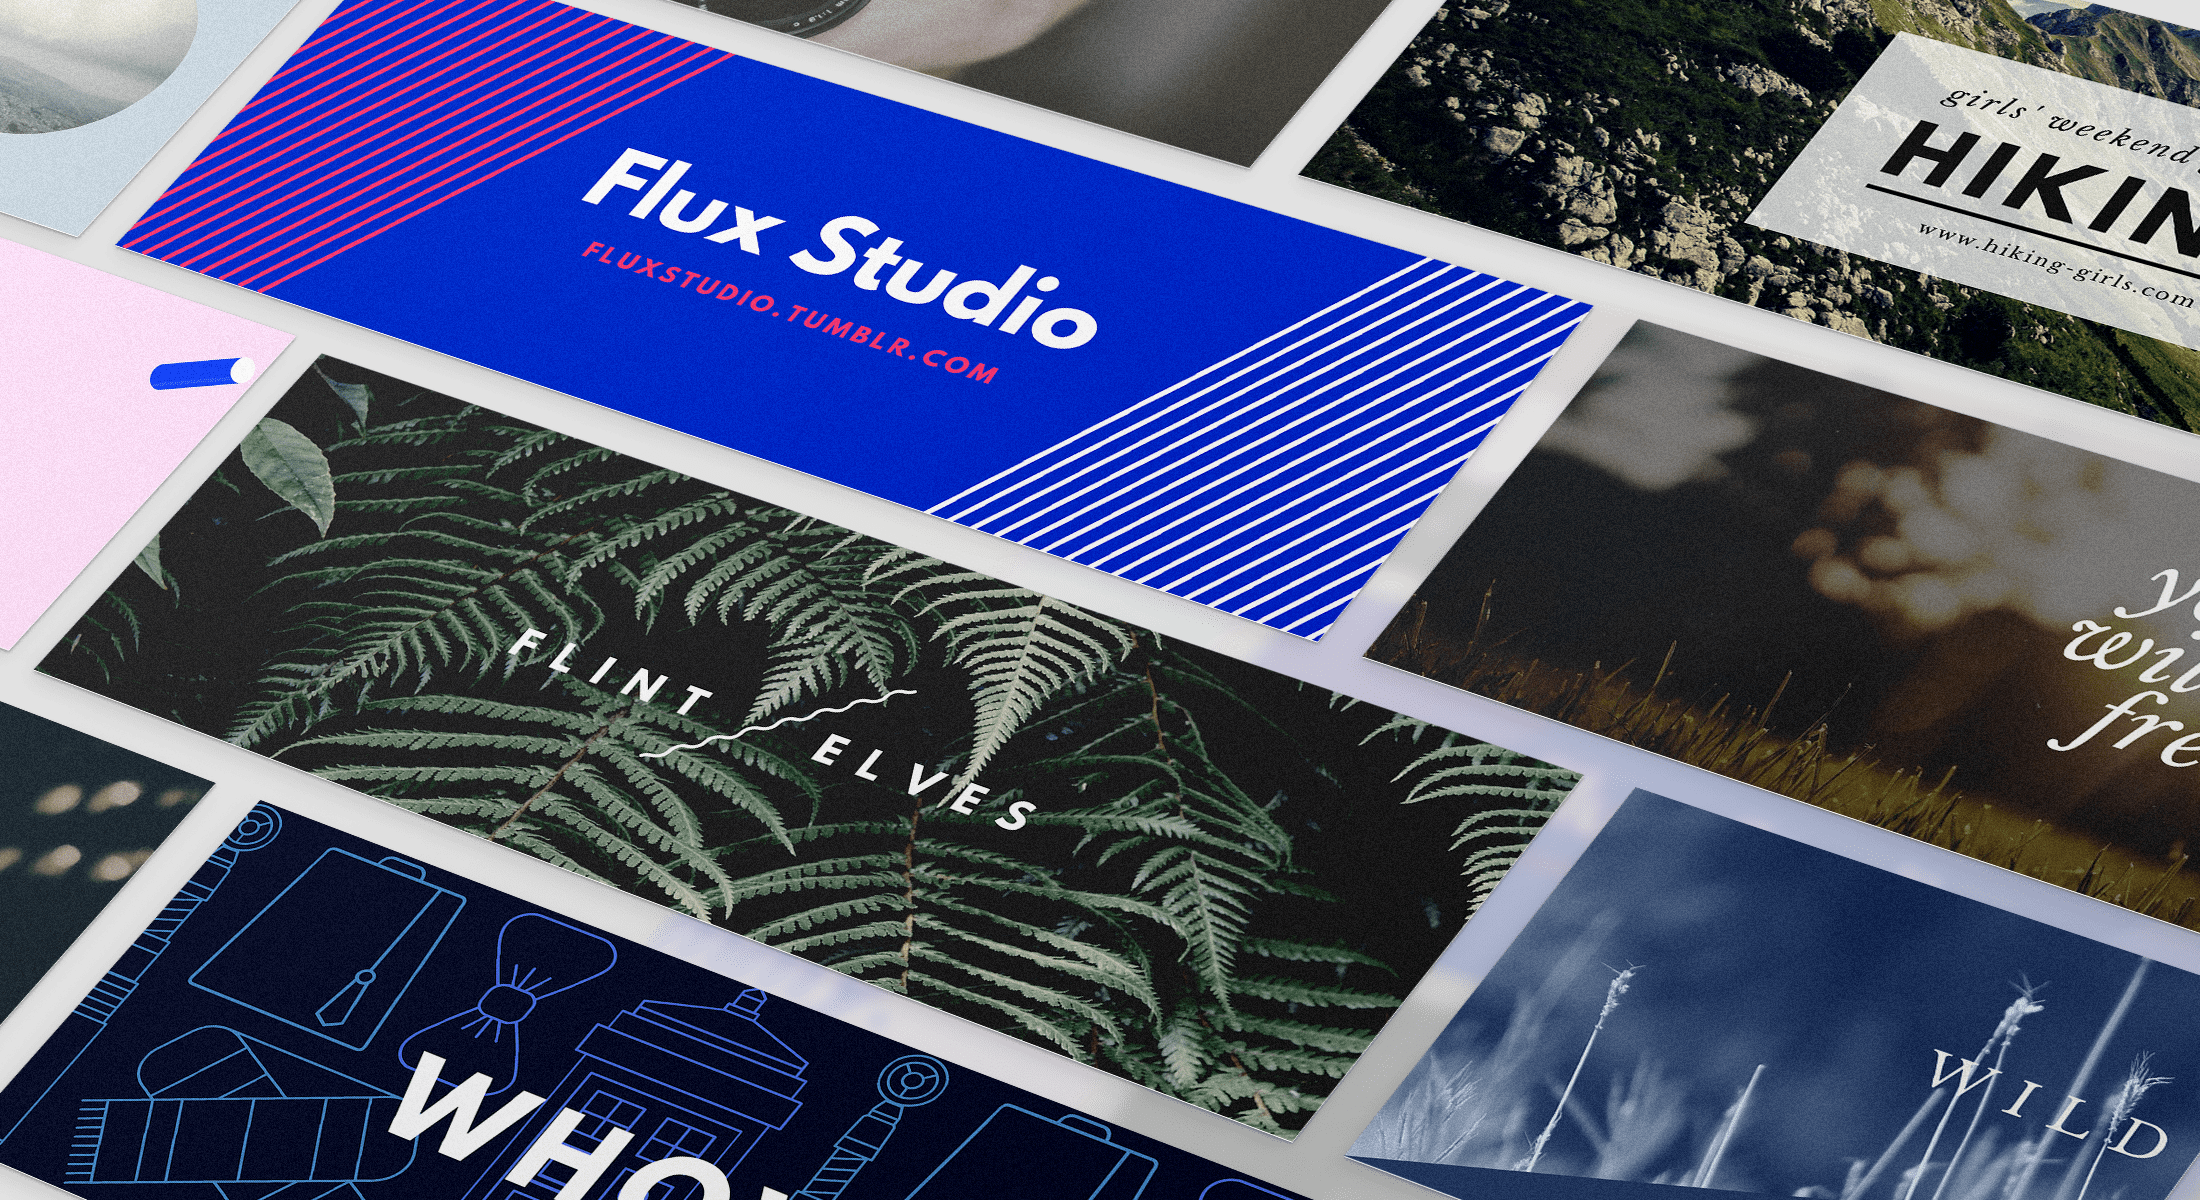 Free Online Banner Maker: Design Custom Banners in Canva